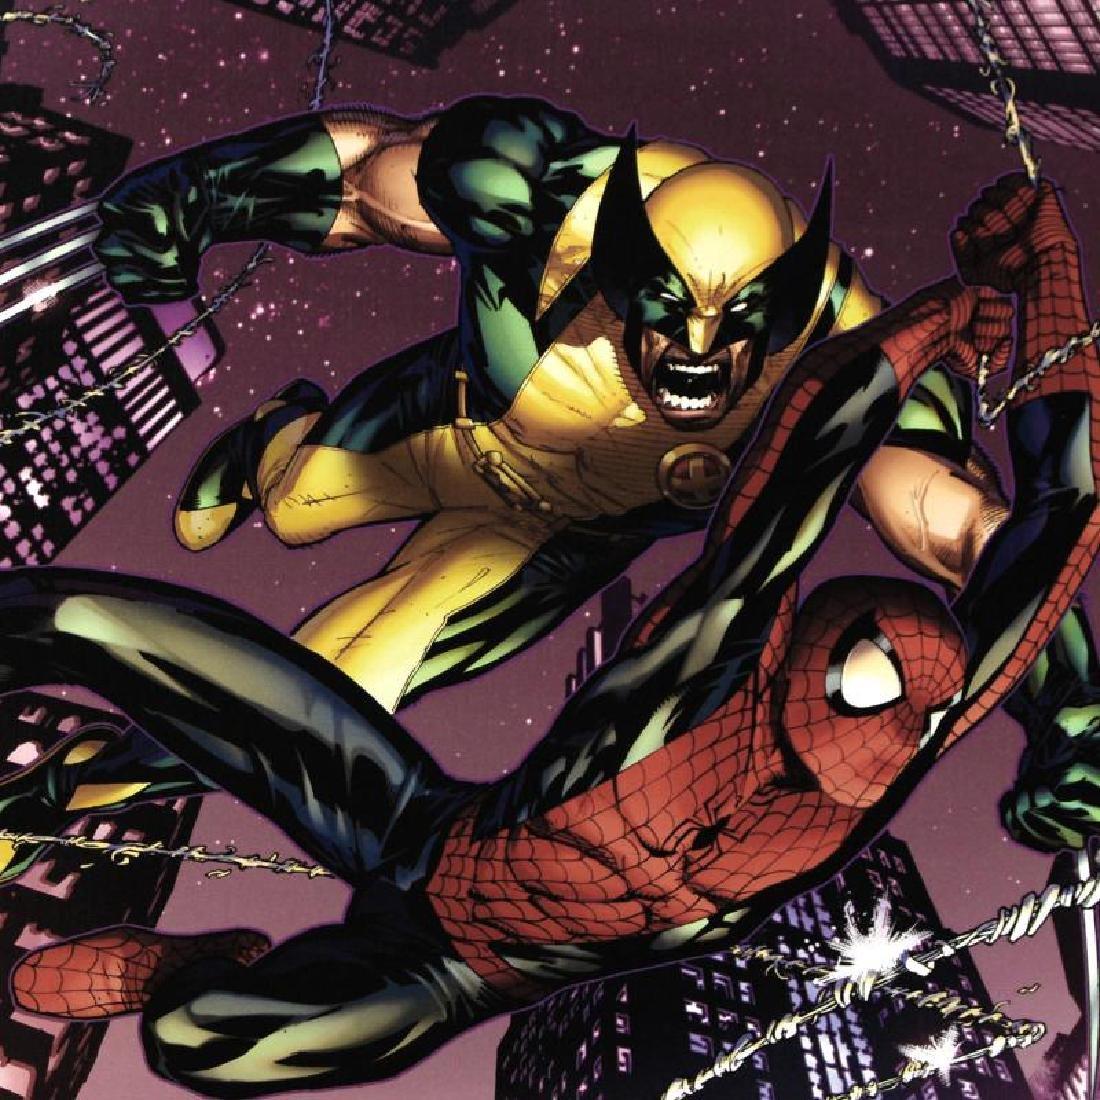 Astonishing Spider-Man & Wolverine #1 by Marvel Comics - 2